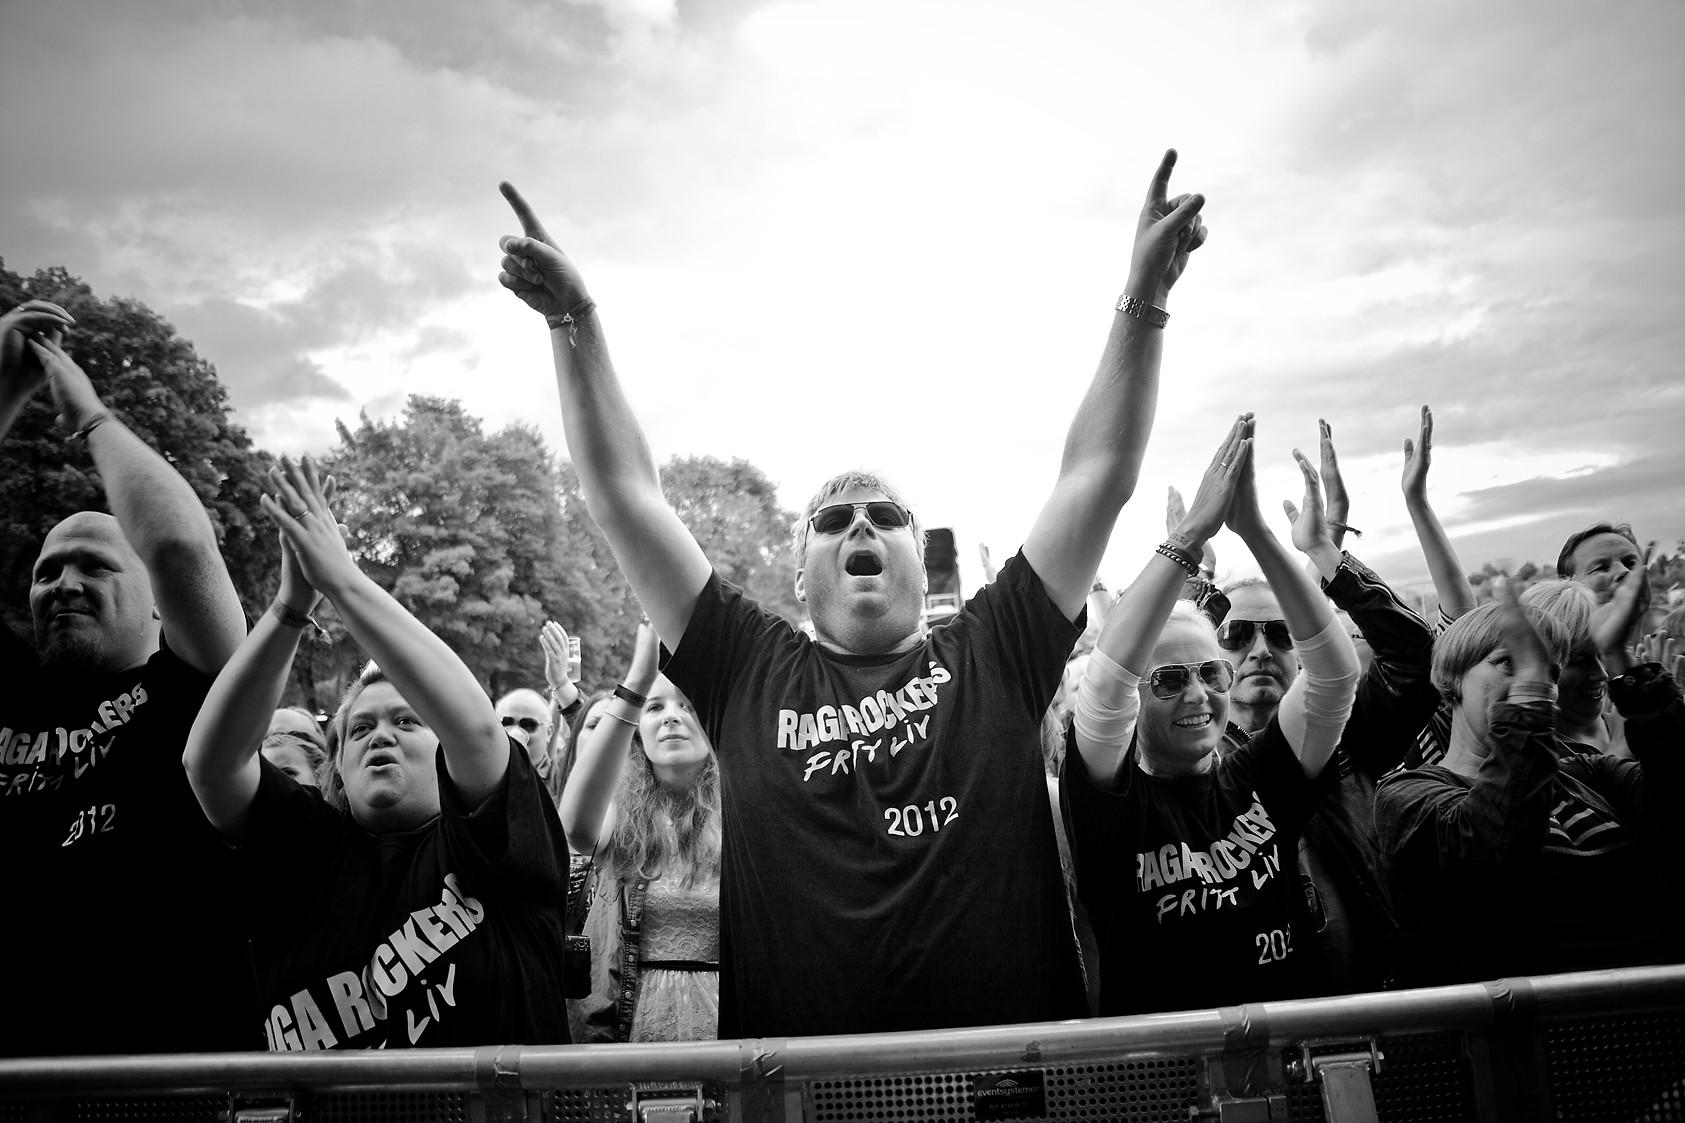 raga rockers // pstereo //2012